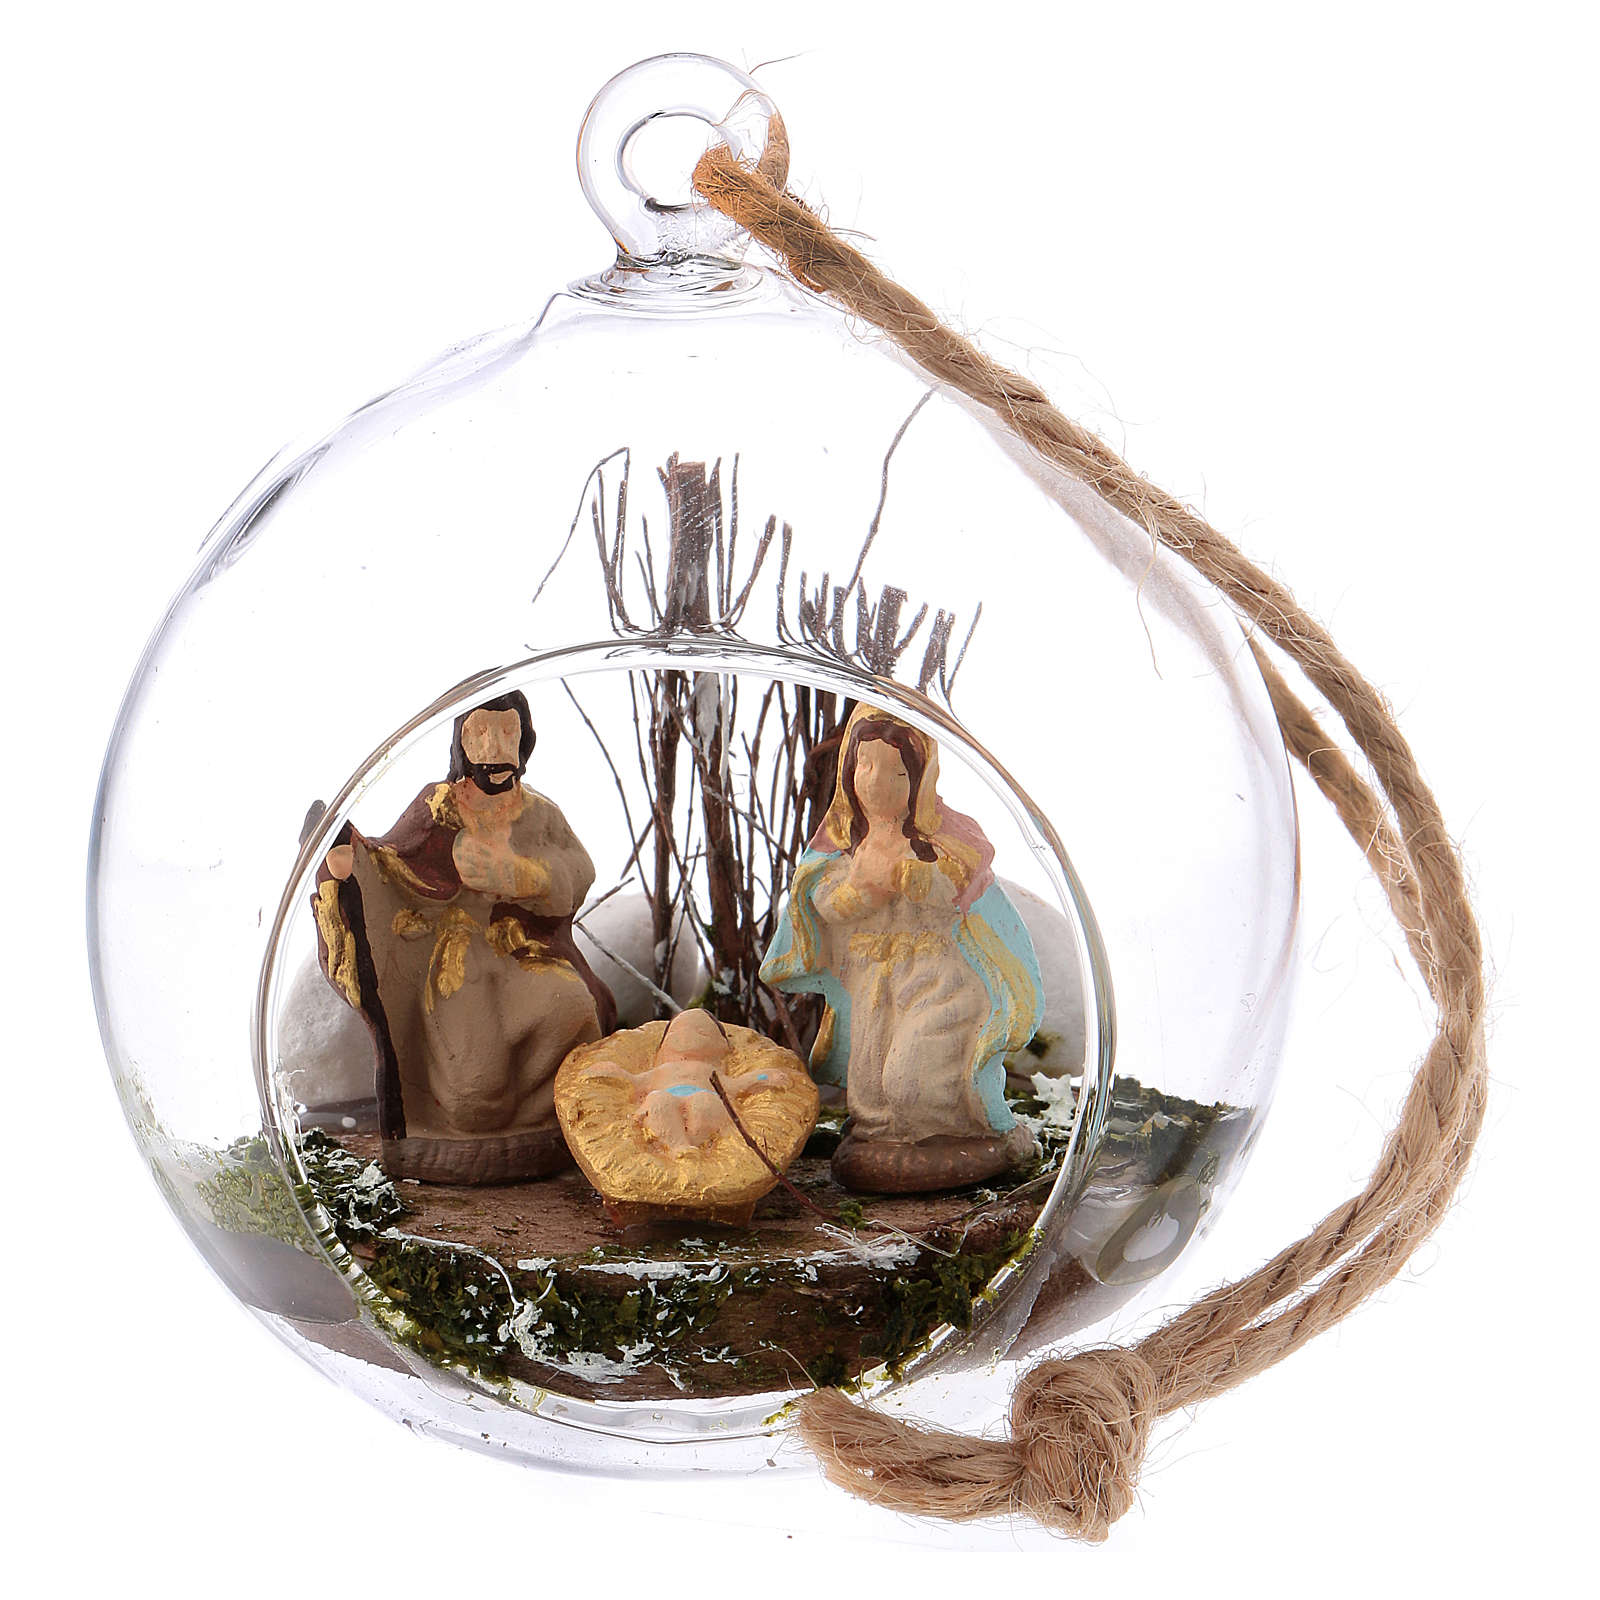 Belén 4 cm terracota Deruta en el interior de una esfera de vidrio 10x10x10 cm 4